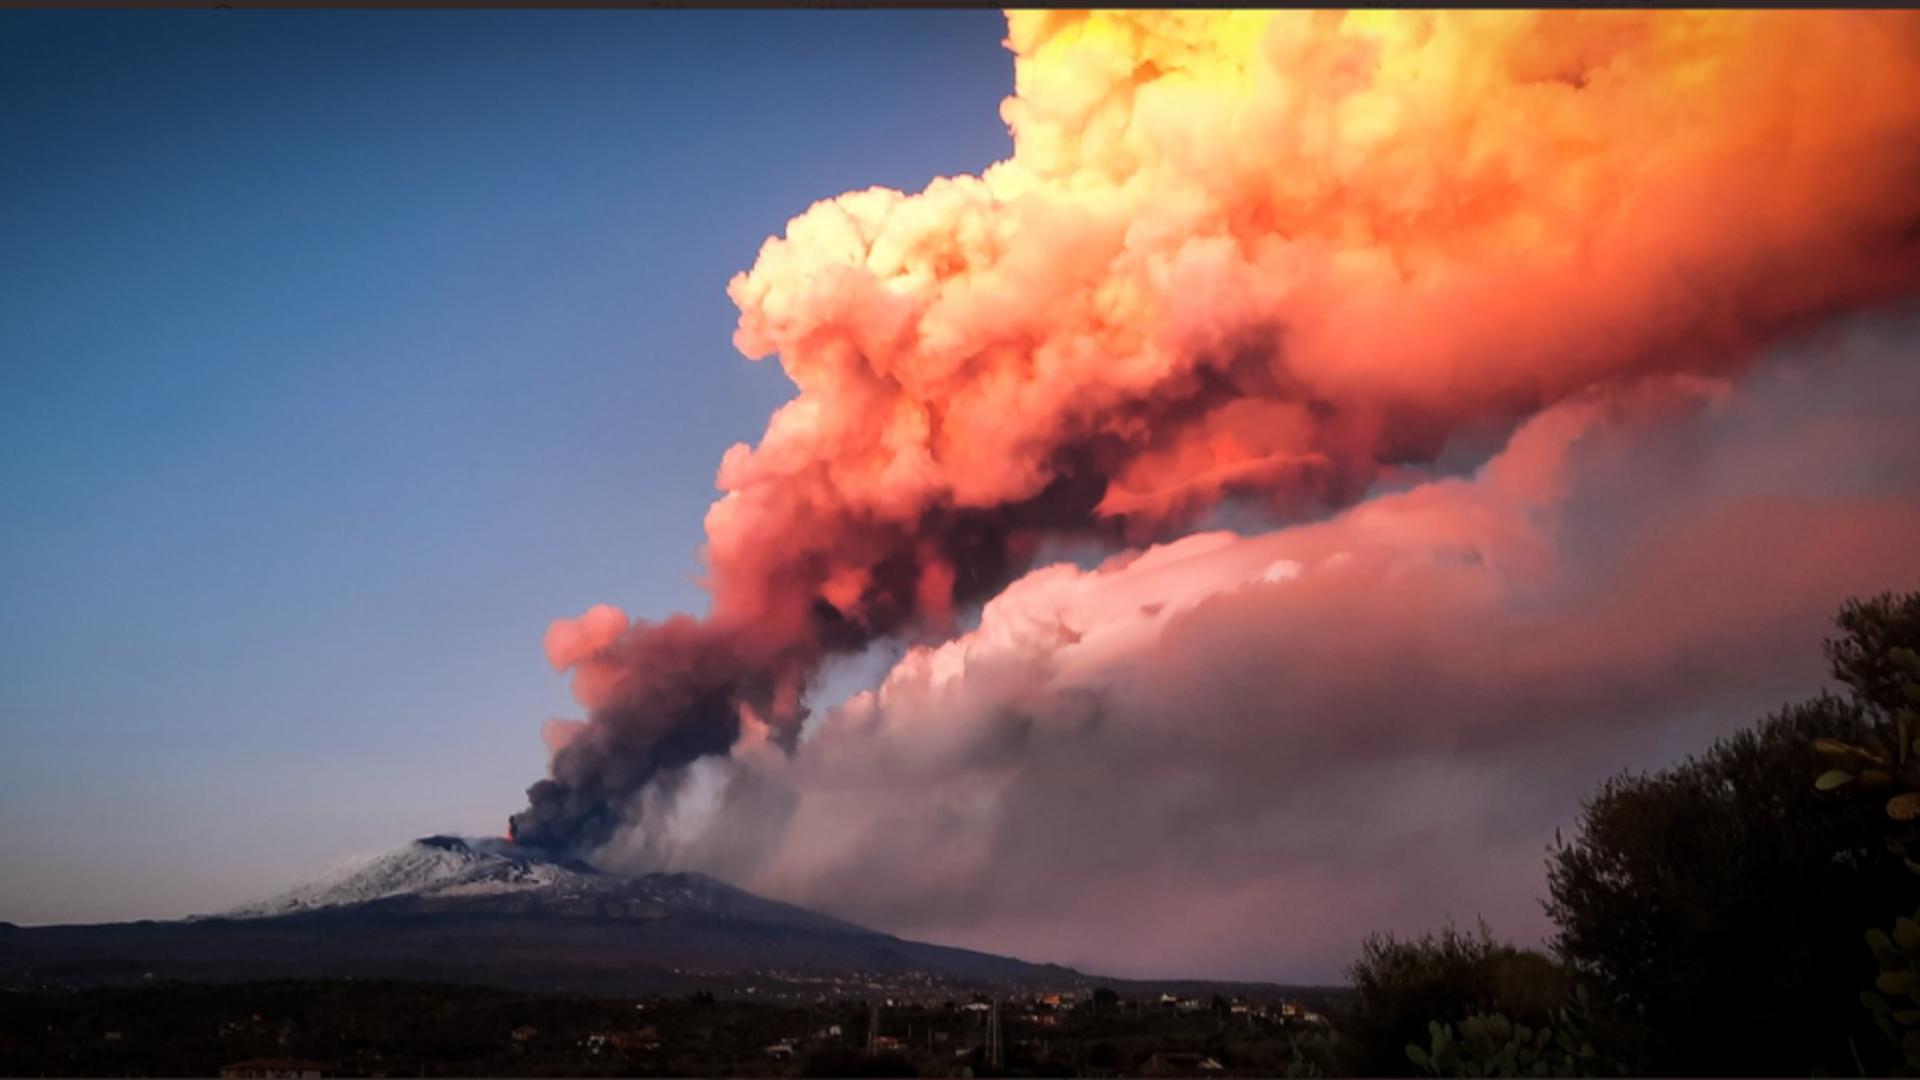 Nor vulcanic